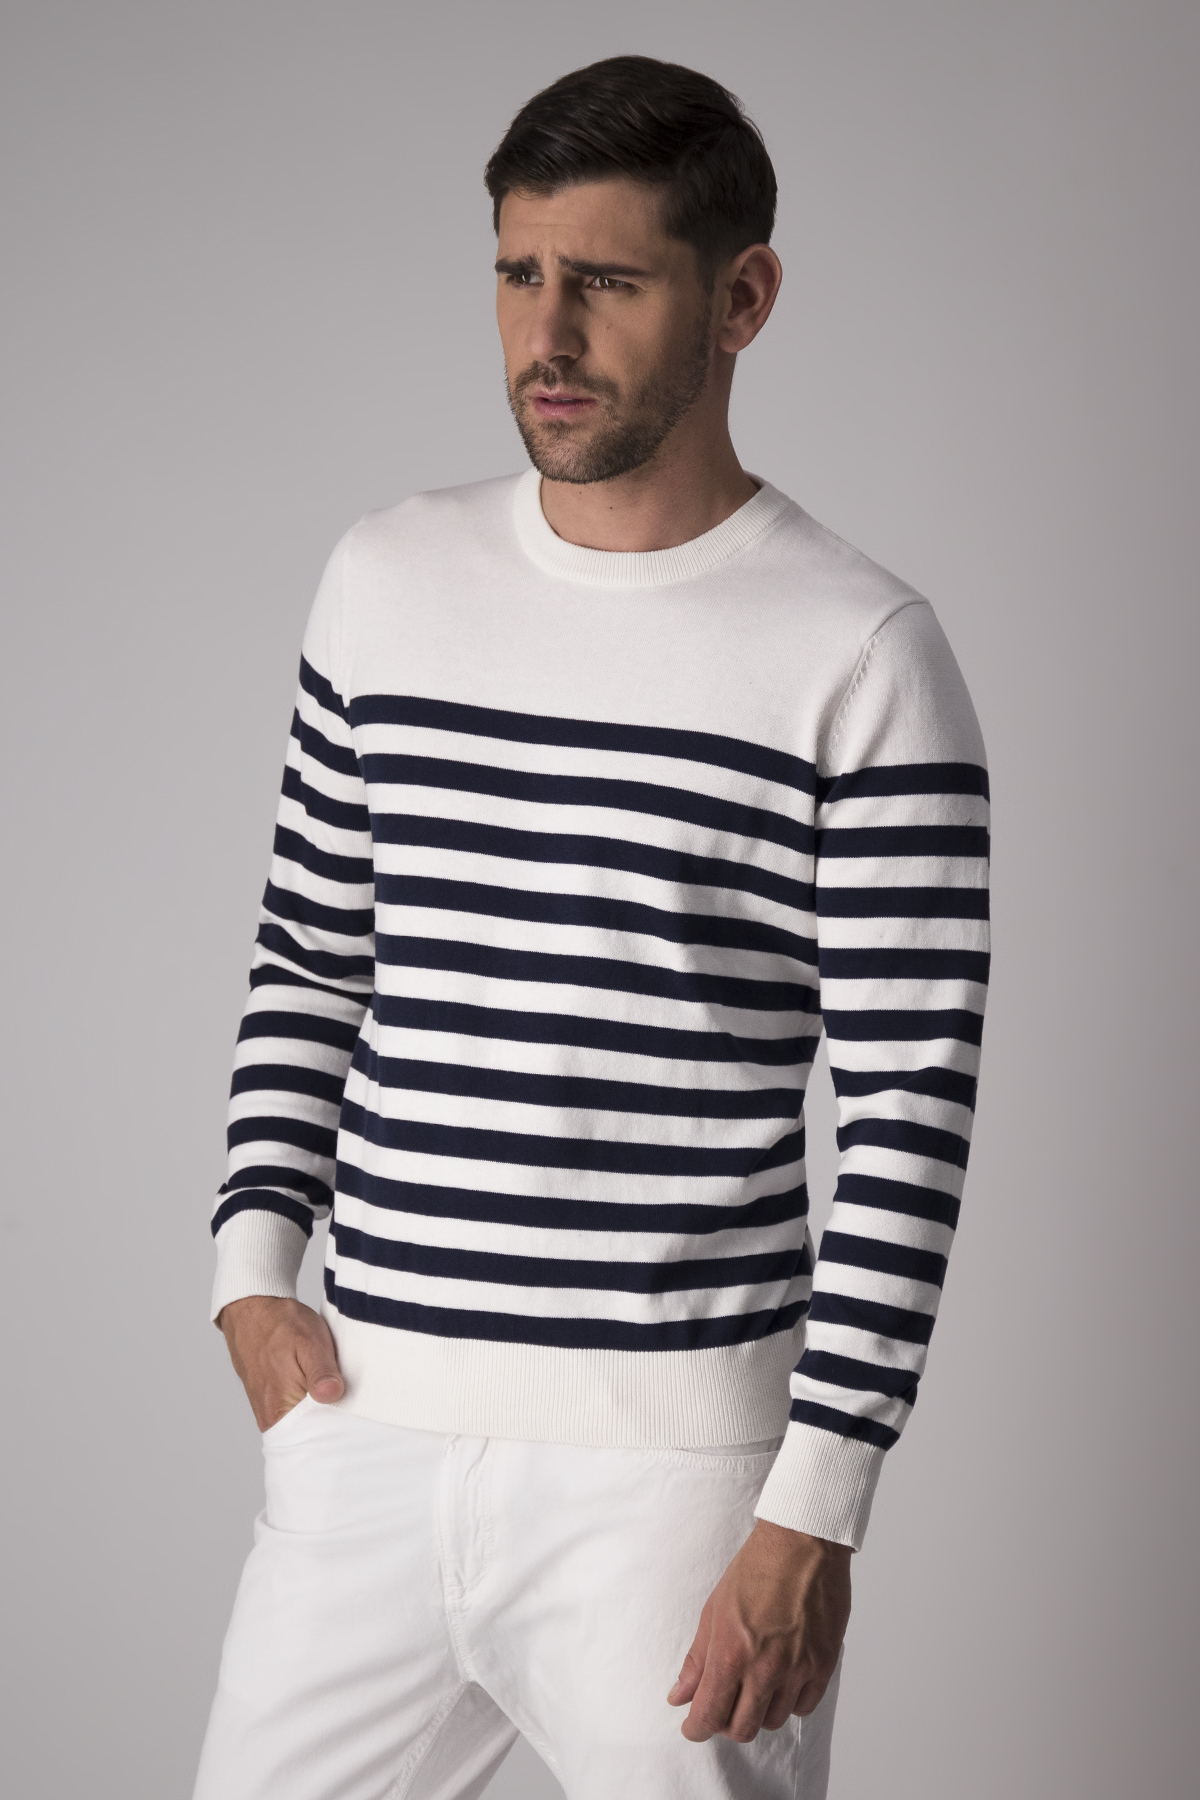 Suéter Robert´s, modelo náutico, blanco rayas azules.